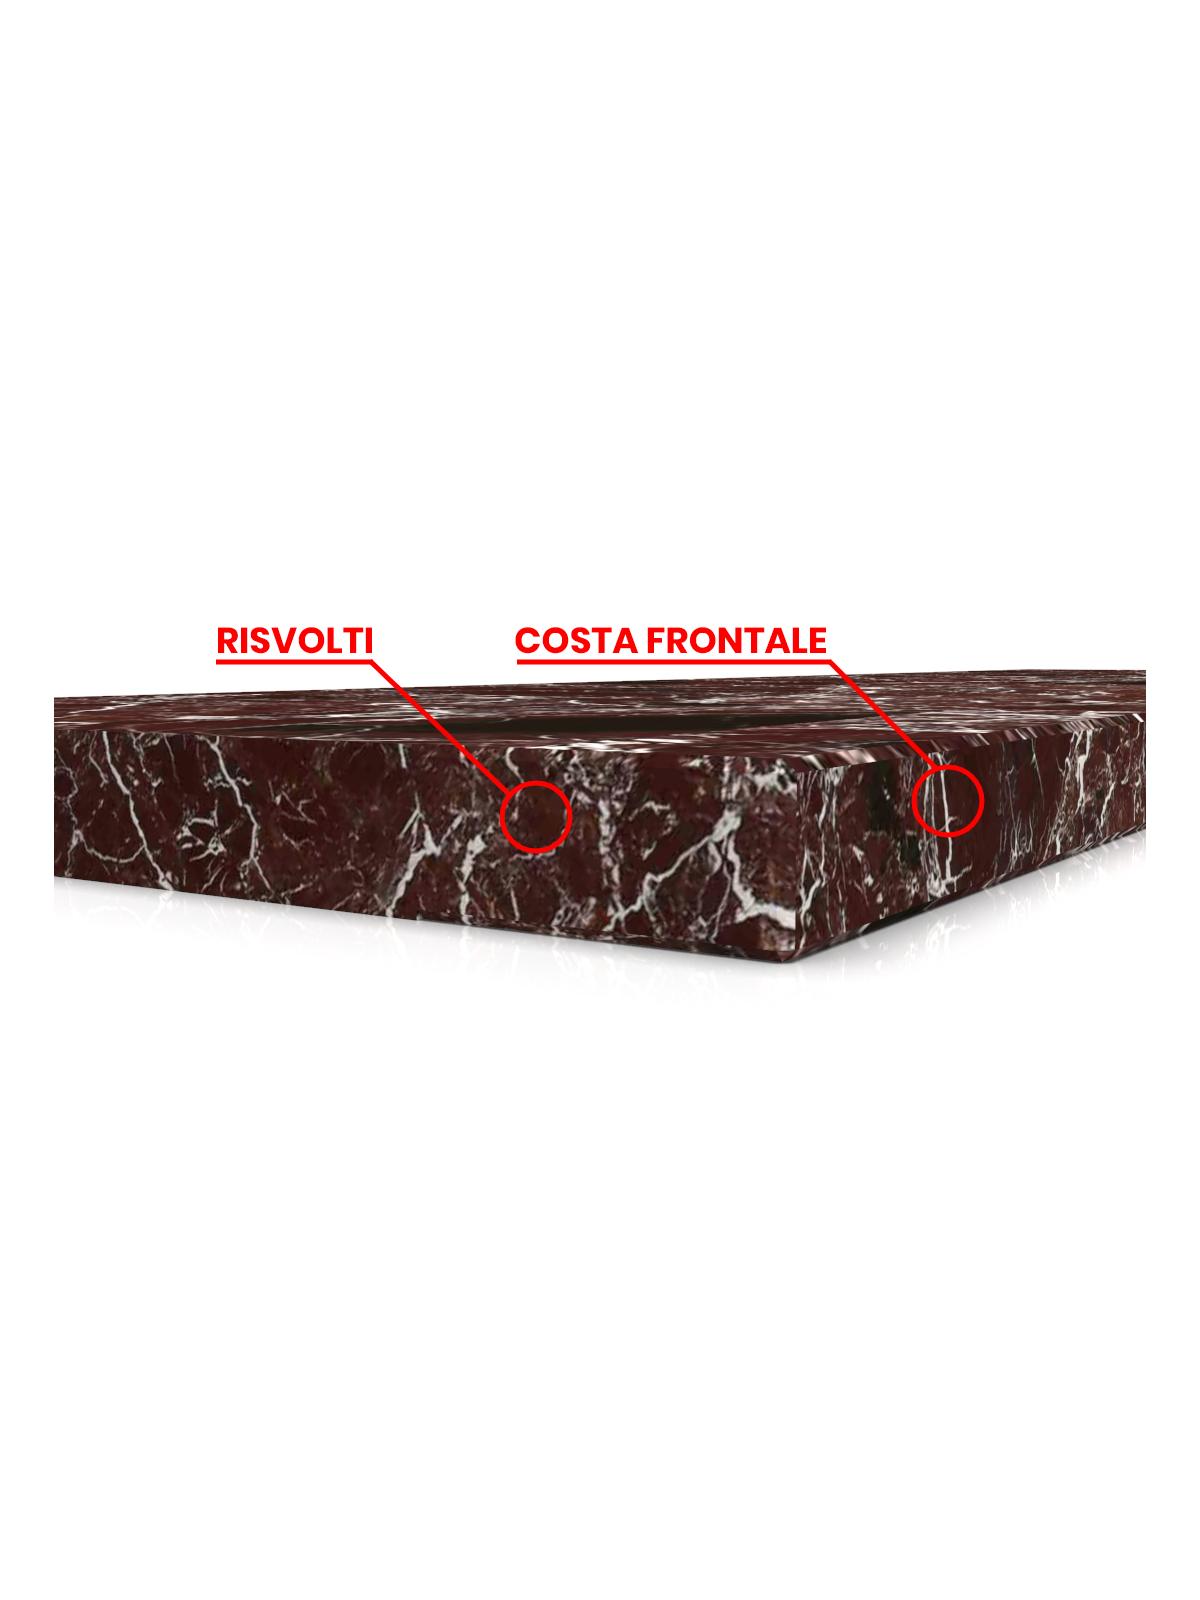 Trittstufe aus Rosso Levanto Marmor